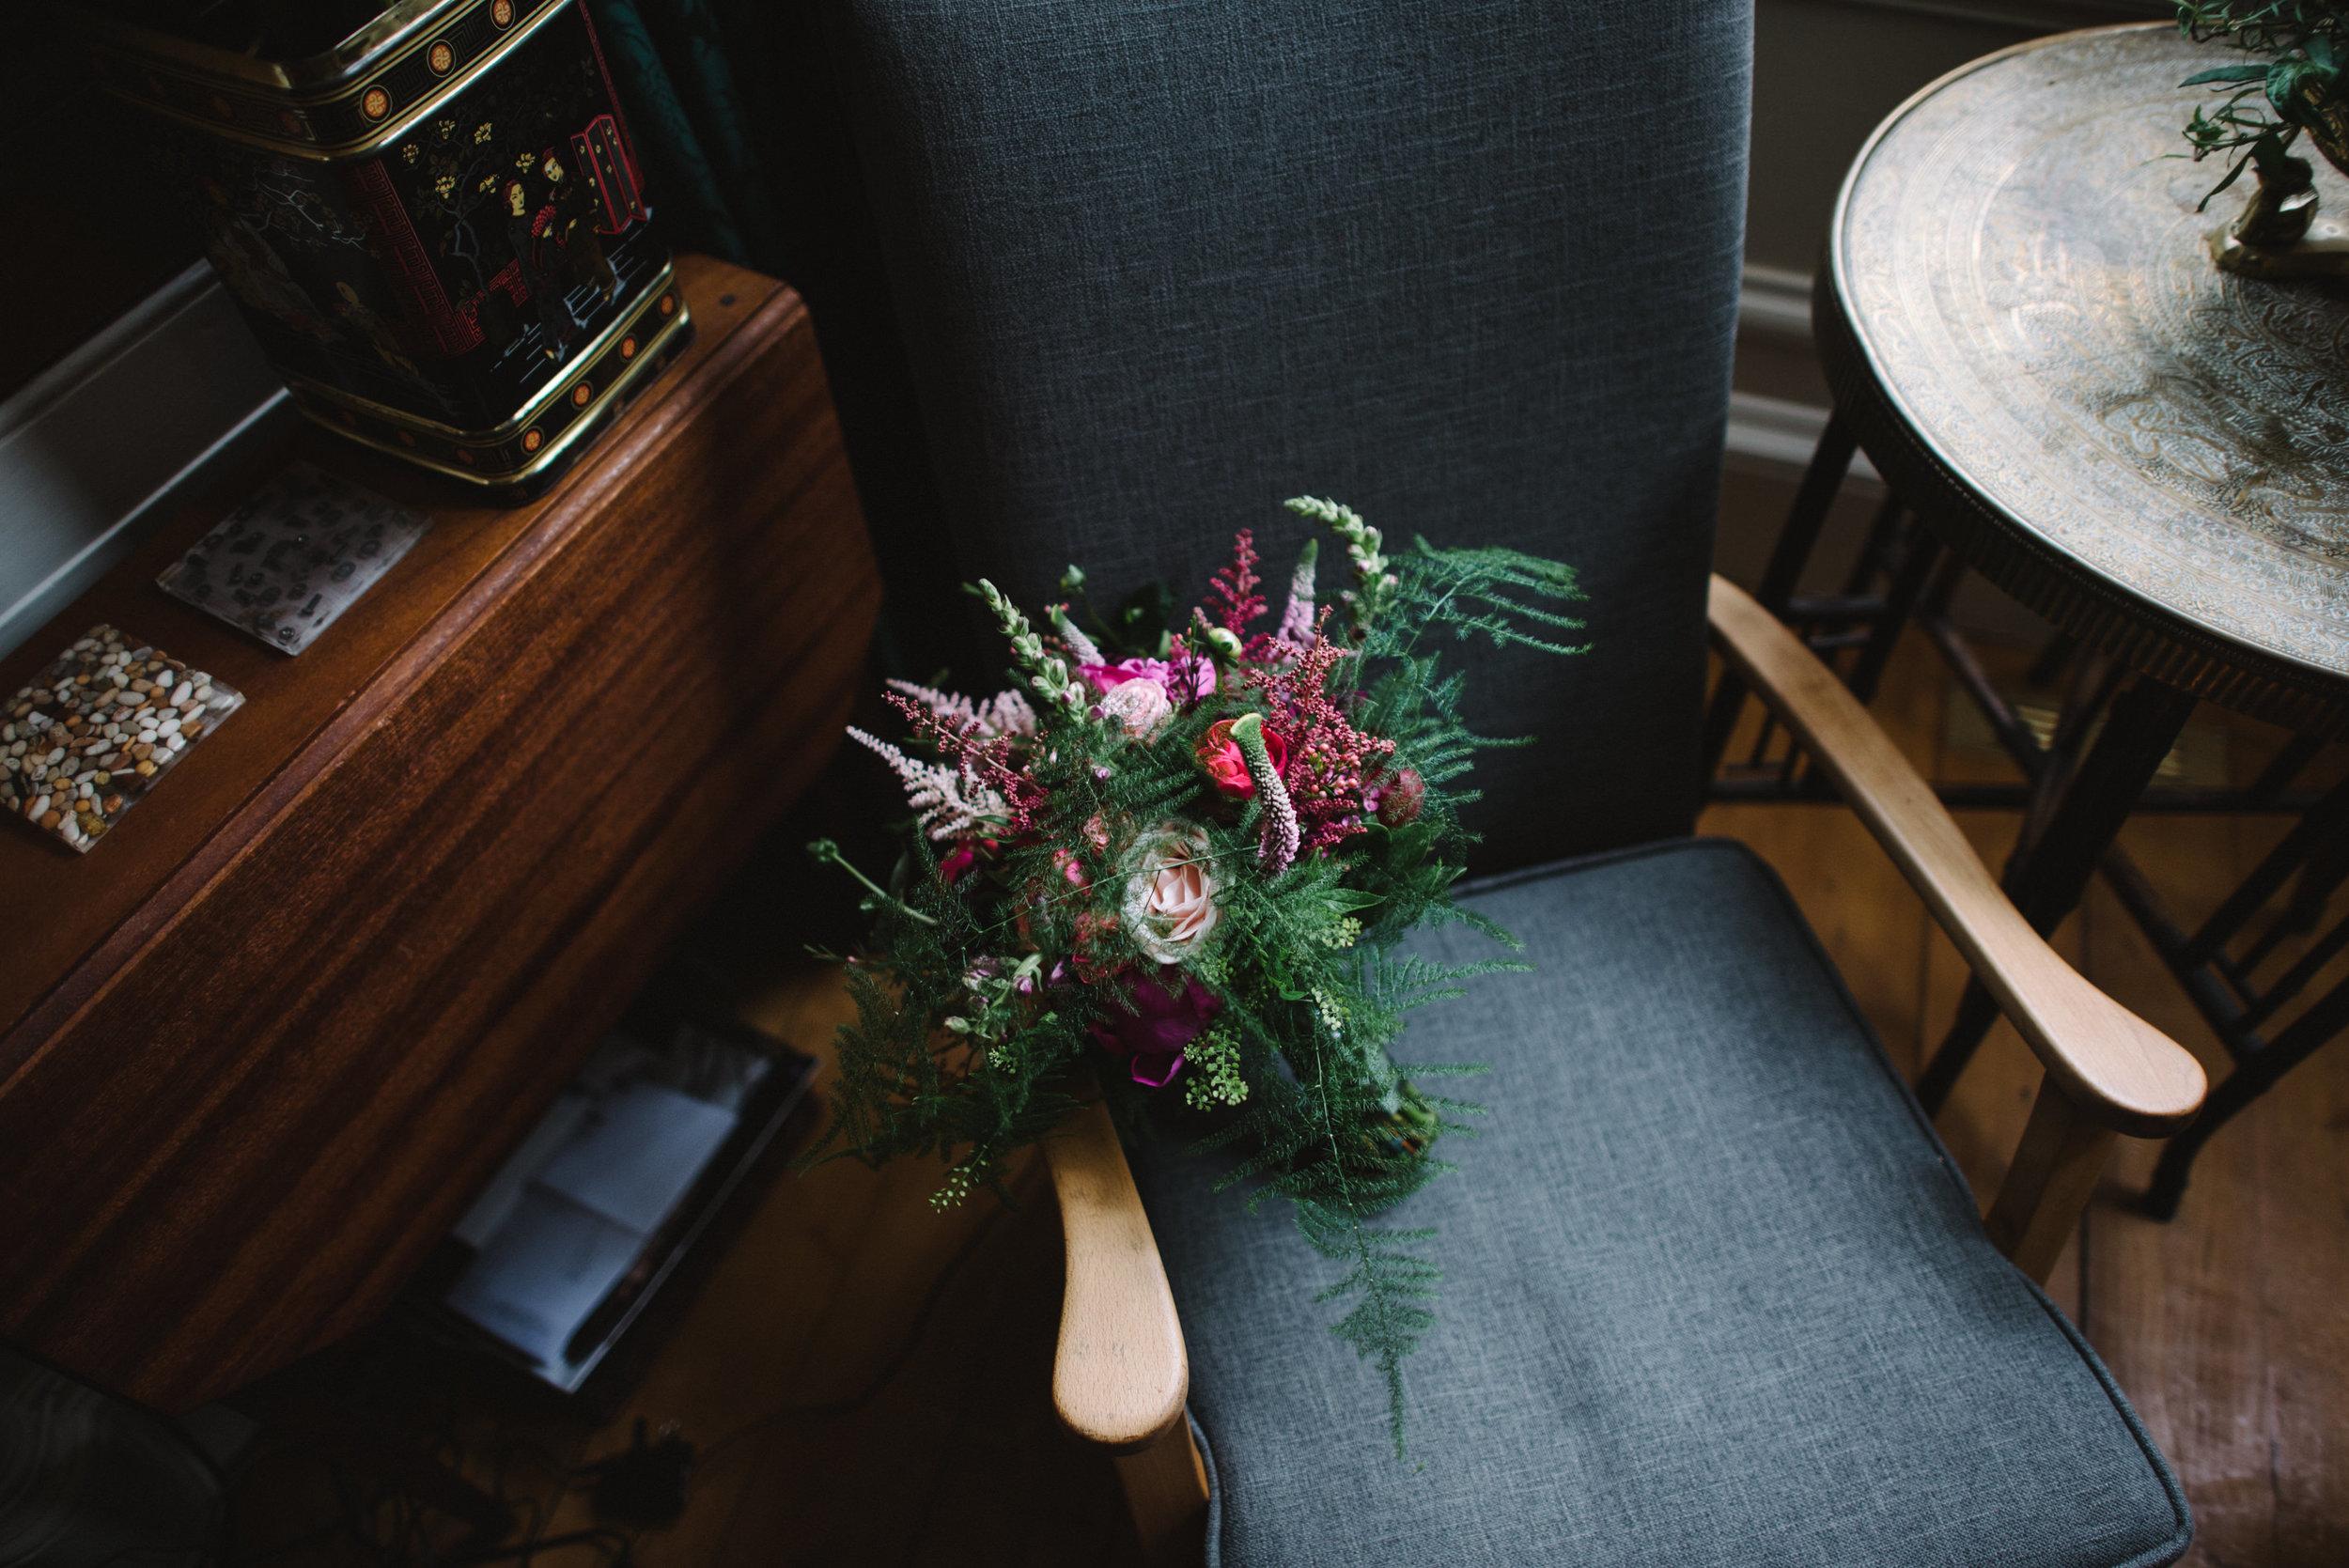 0145-LISA-DEVINE-PHOTOGRAPHY-ALTERNATIVE-WEDDING-PHOTOGRAPHY-SCOTLAND-DESTINATION-WEDDINGS-GLASGOW-WEDDINGS-COOL-WEDDINGS-STYLISH-WEDDINGS.JPG